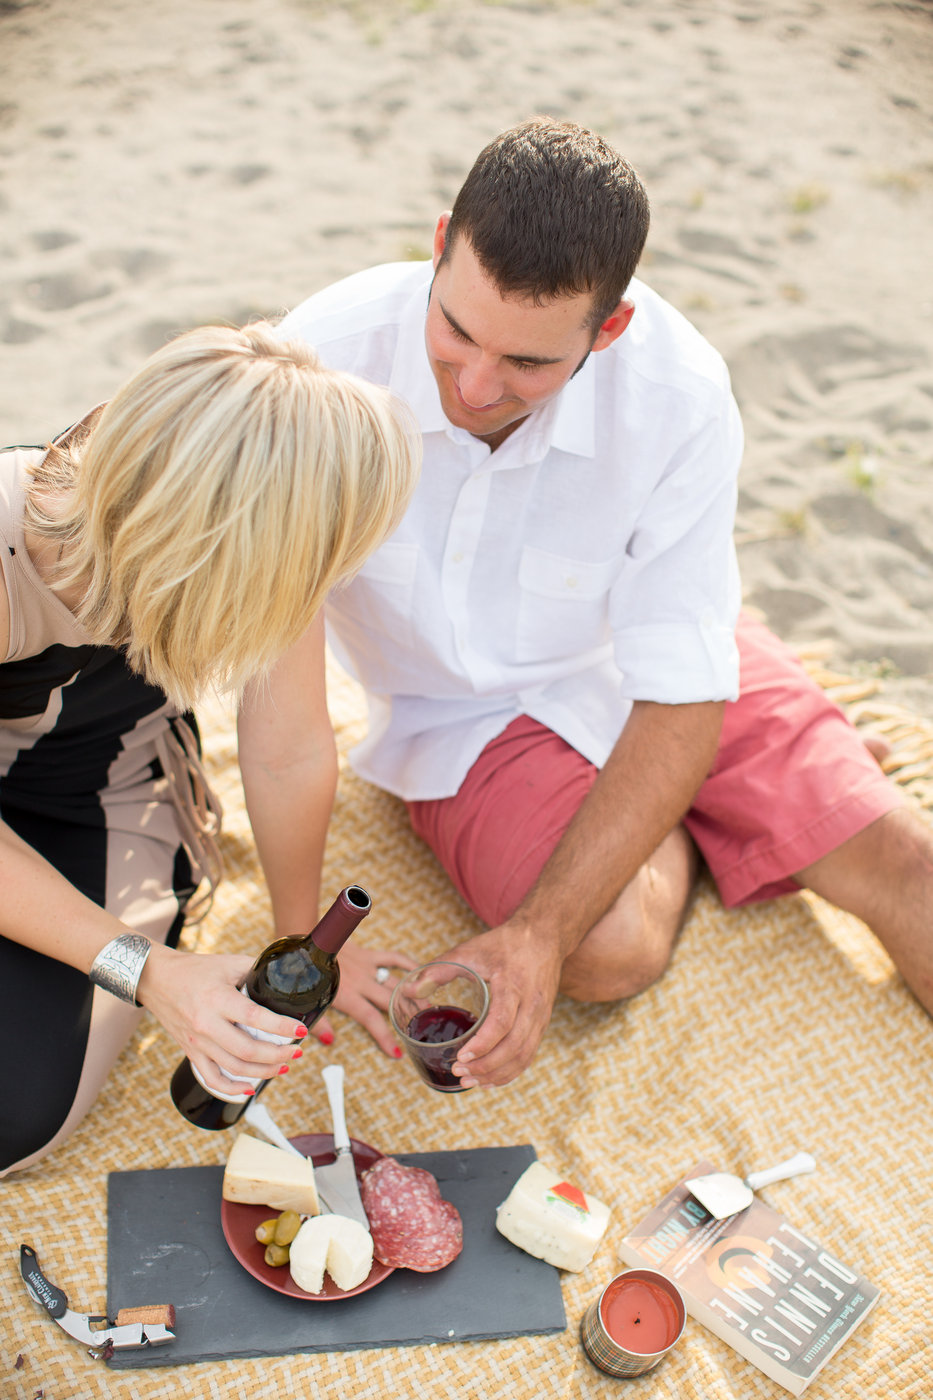 Sacramento-River-engagement-photography-of-cute-couple-on-the-beach.jpg